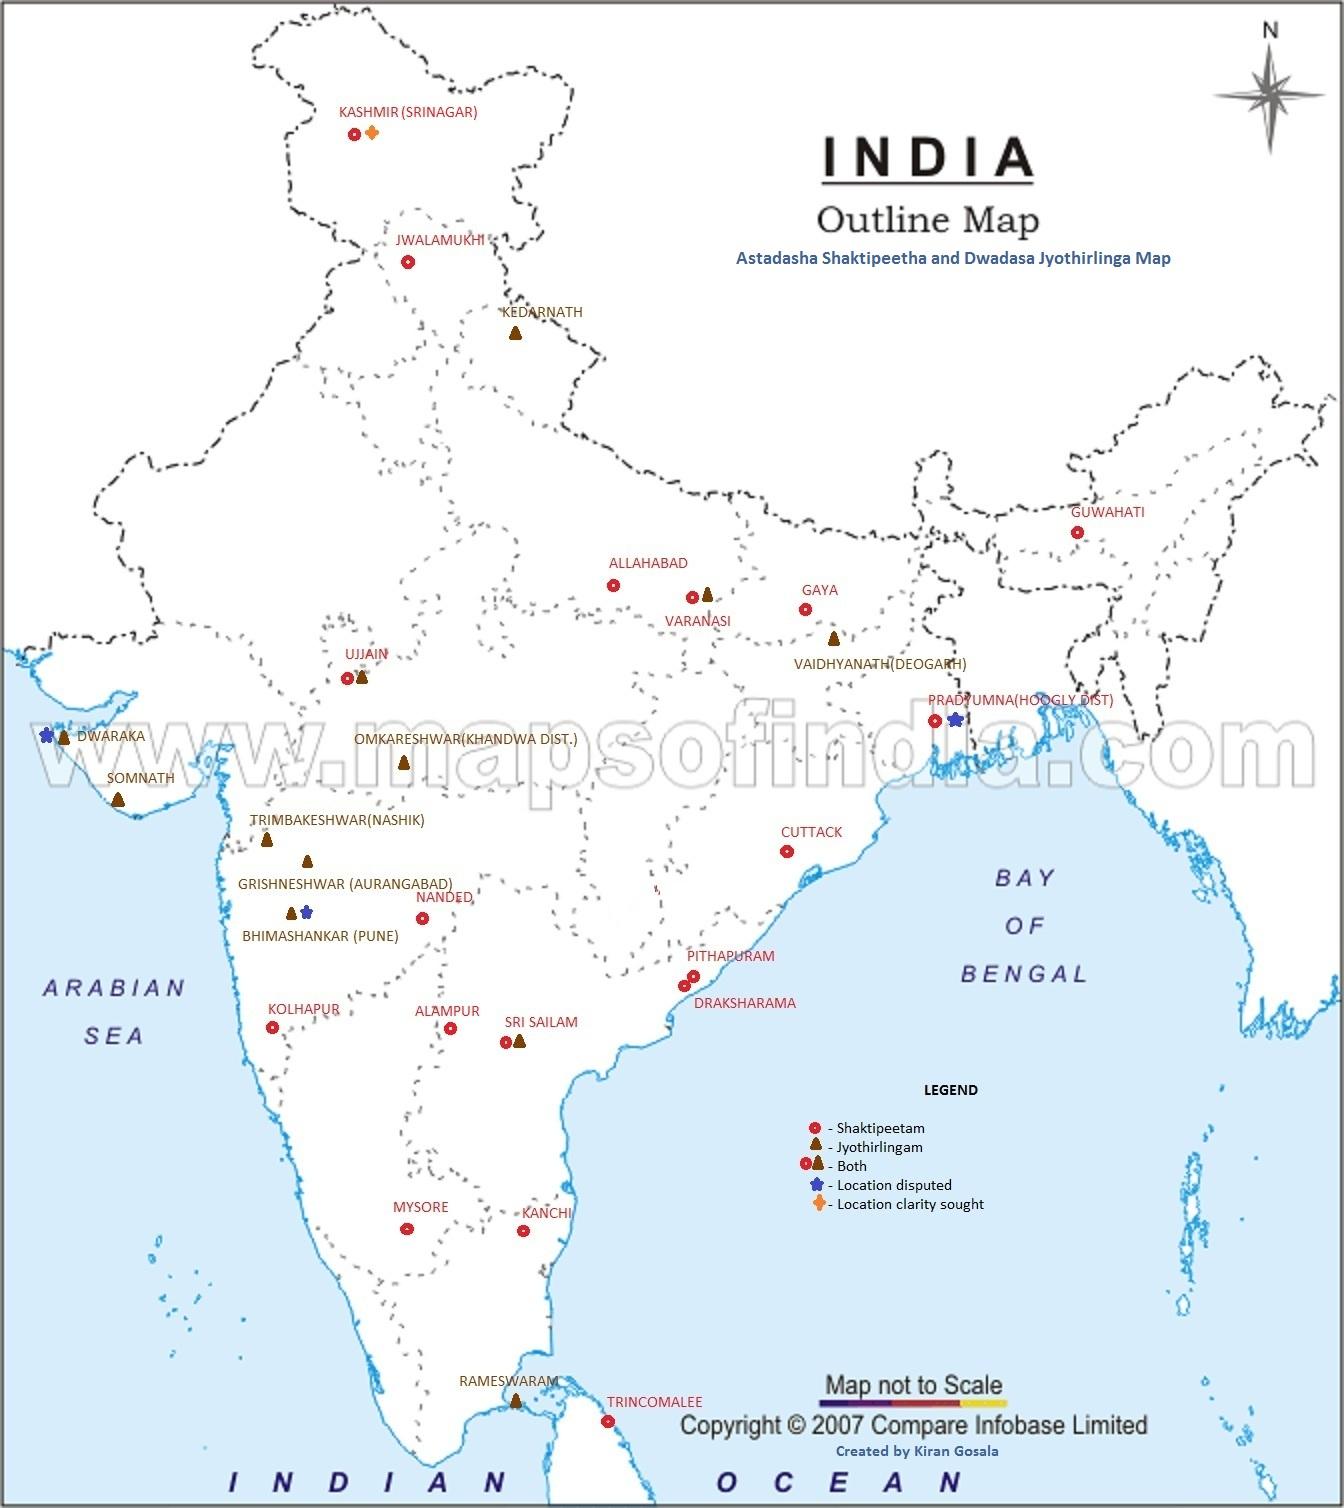 astadasa shaktipeetha and dwadasa jyothirlinga map